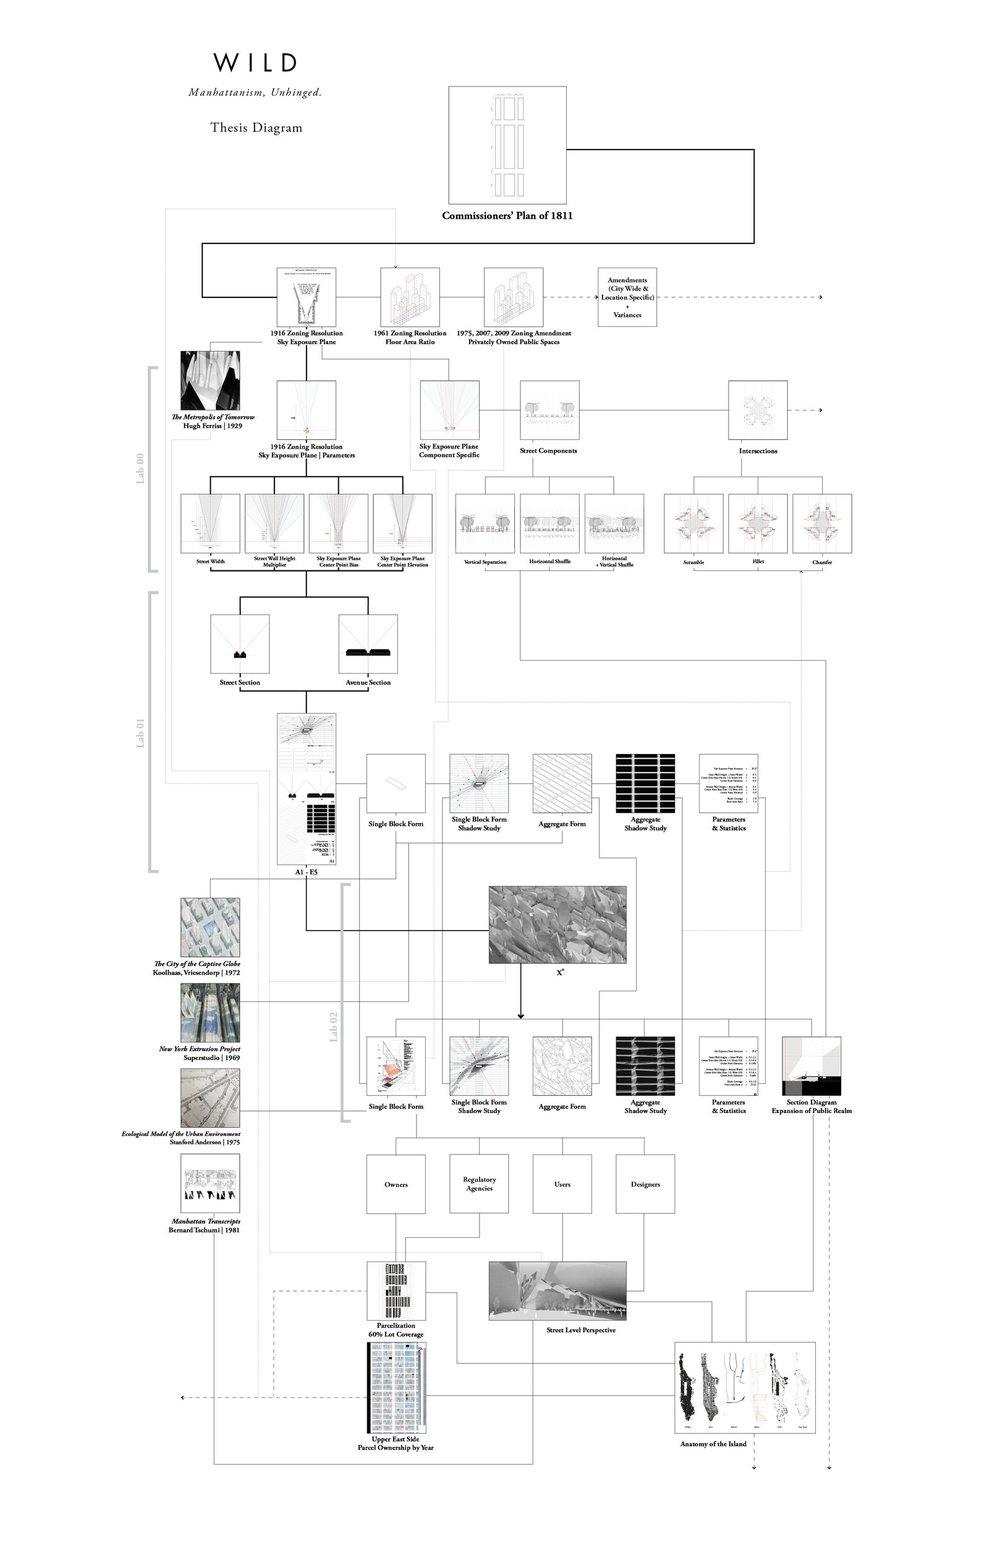 Yeo_Project Diagram.jpg